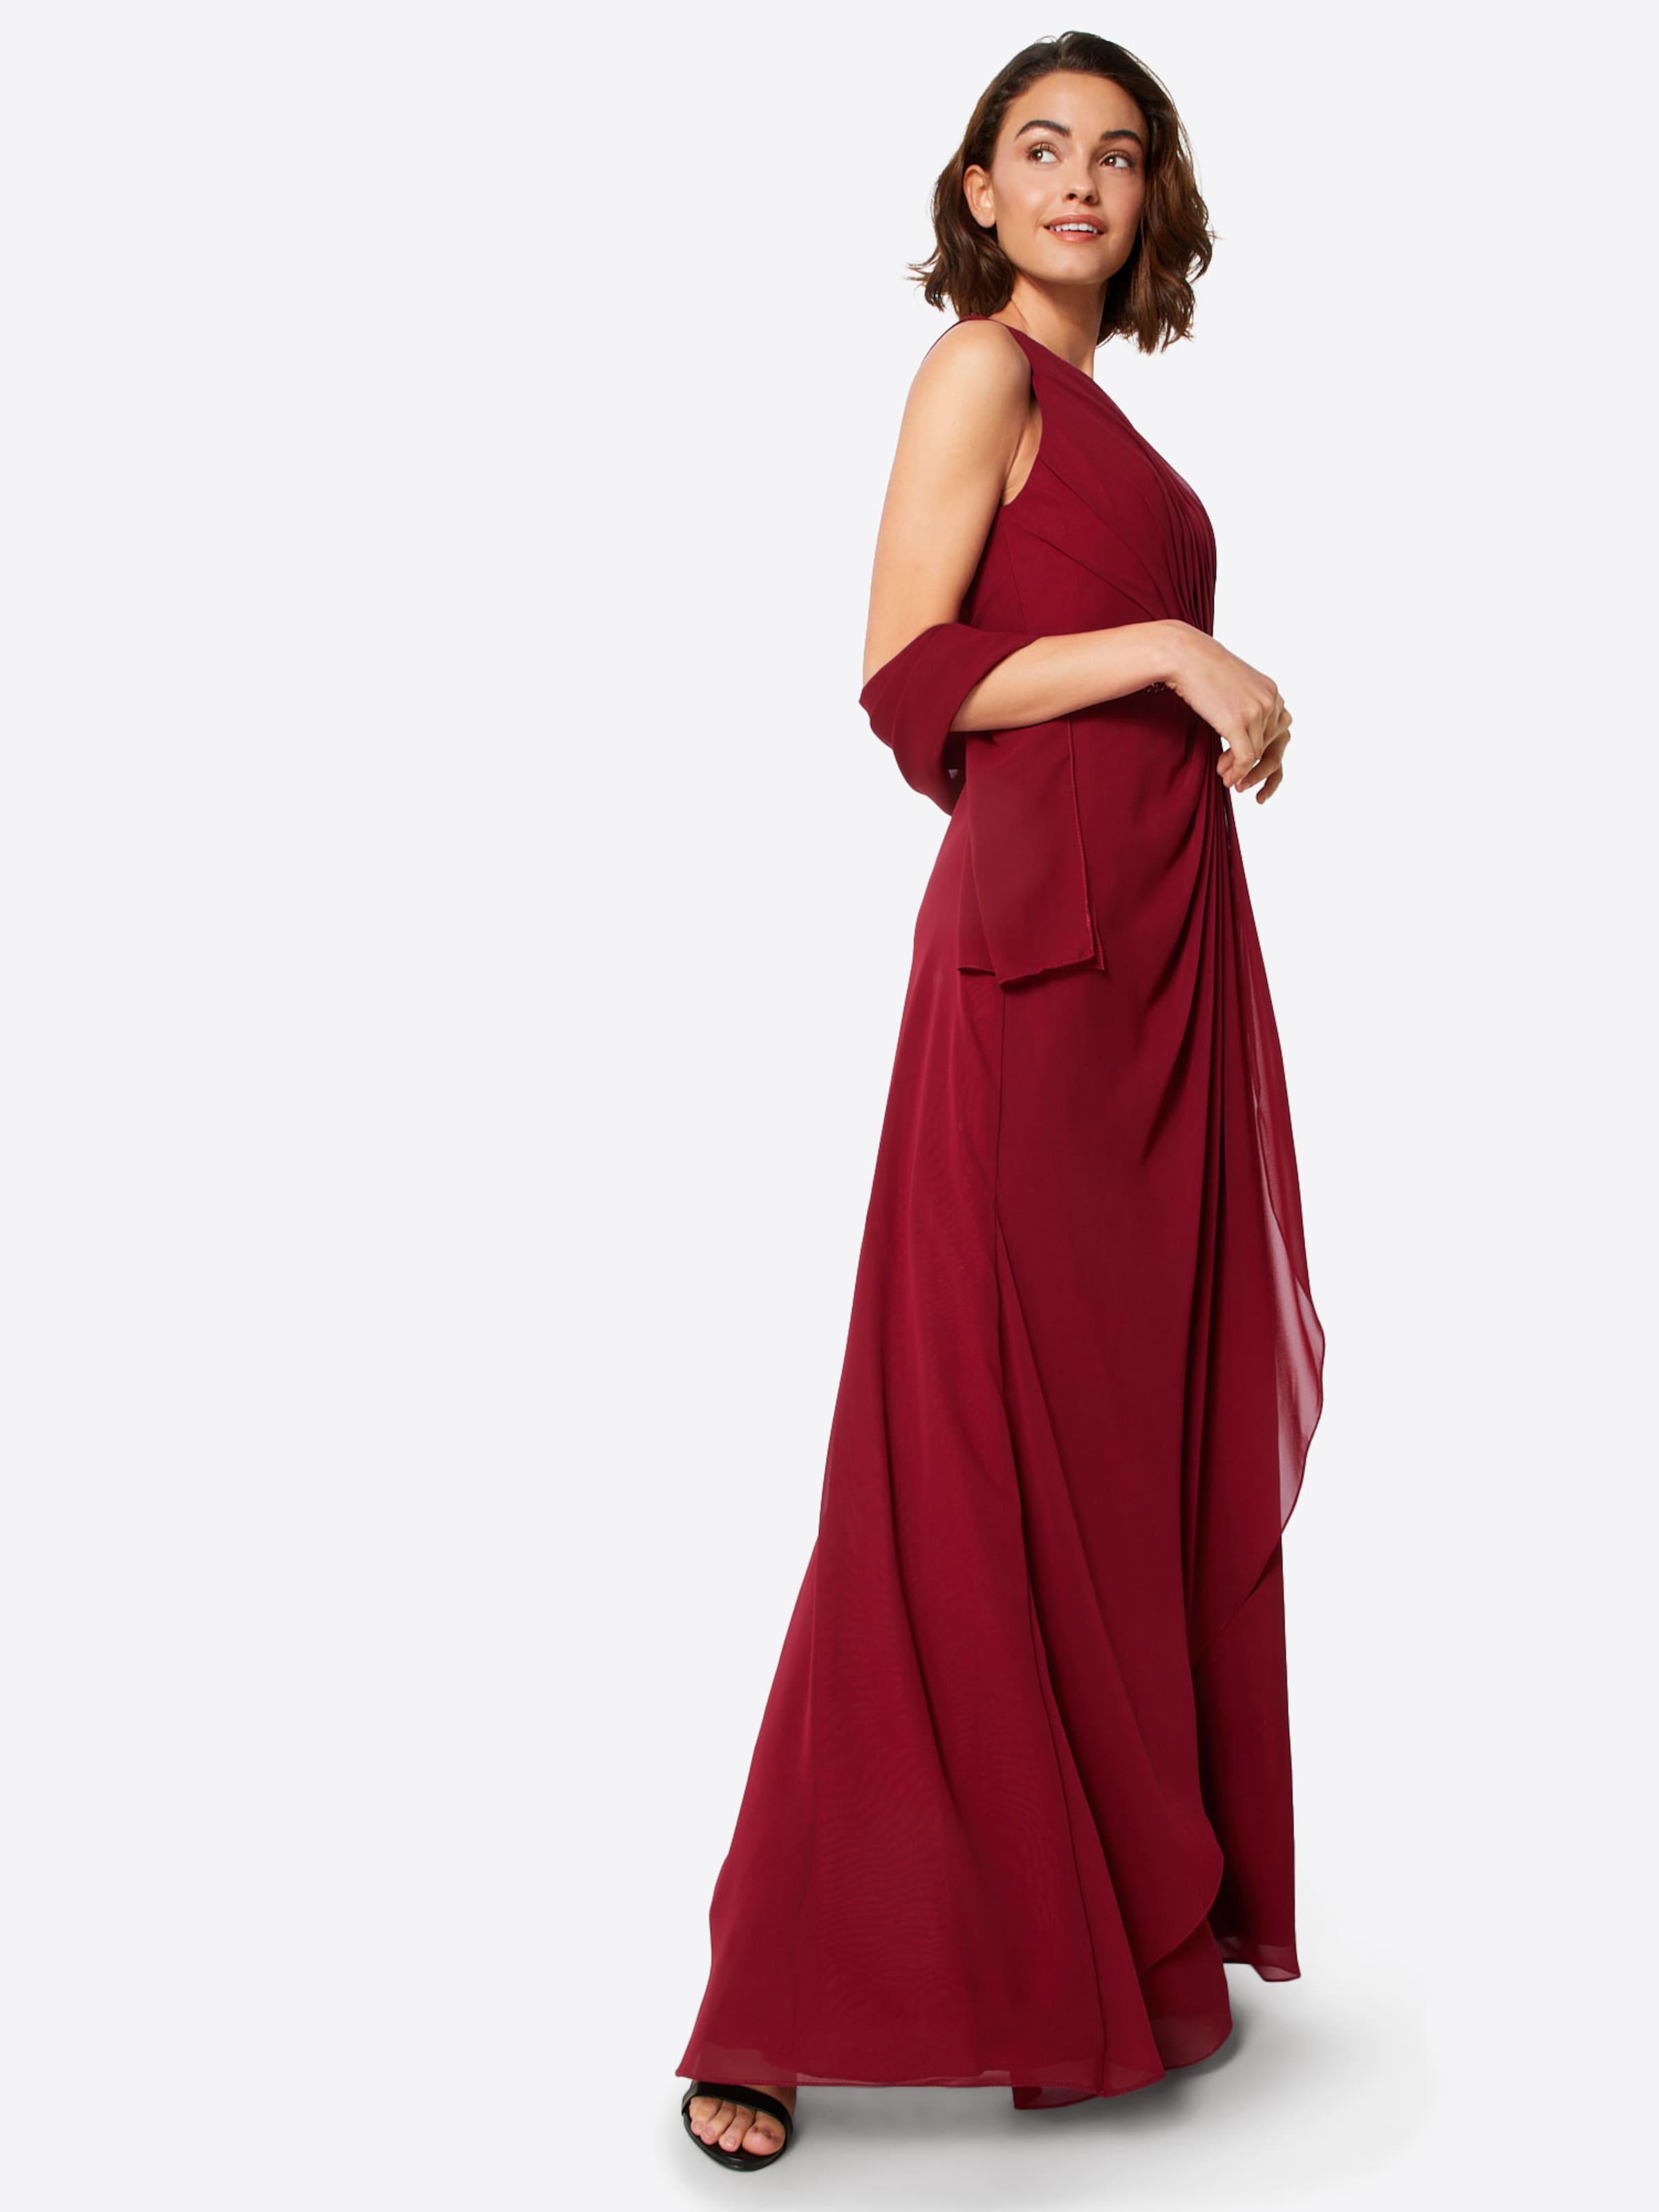 Kleid Mascara In 'mc181250b' Bordeaux 54jLc3RqA